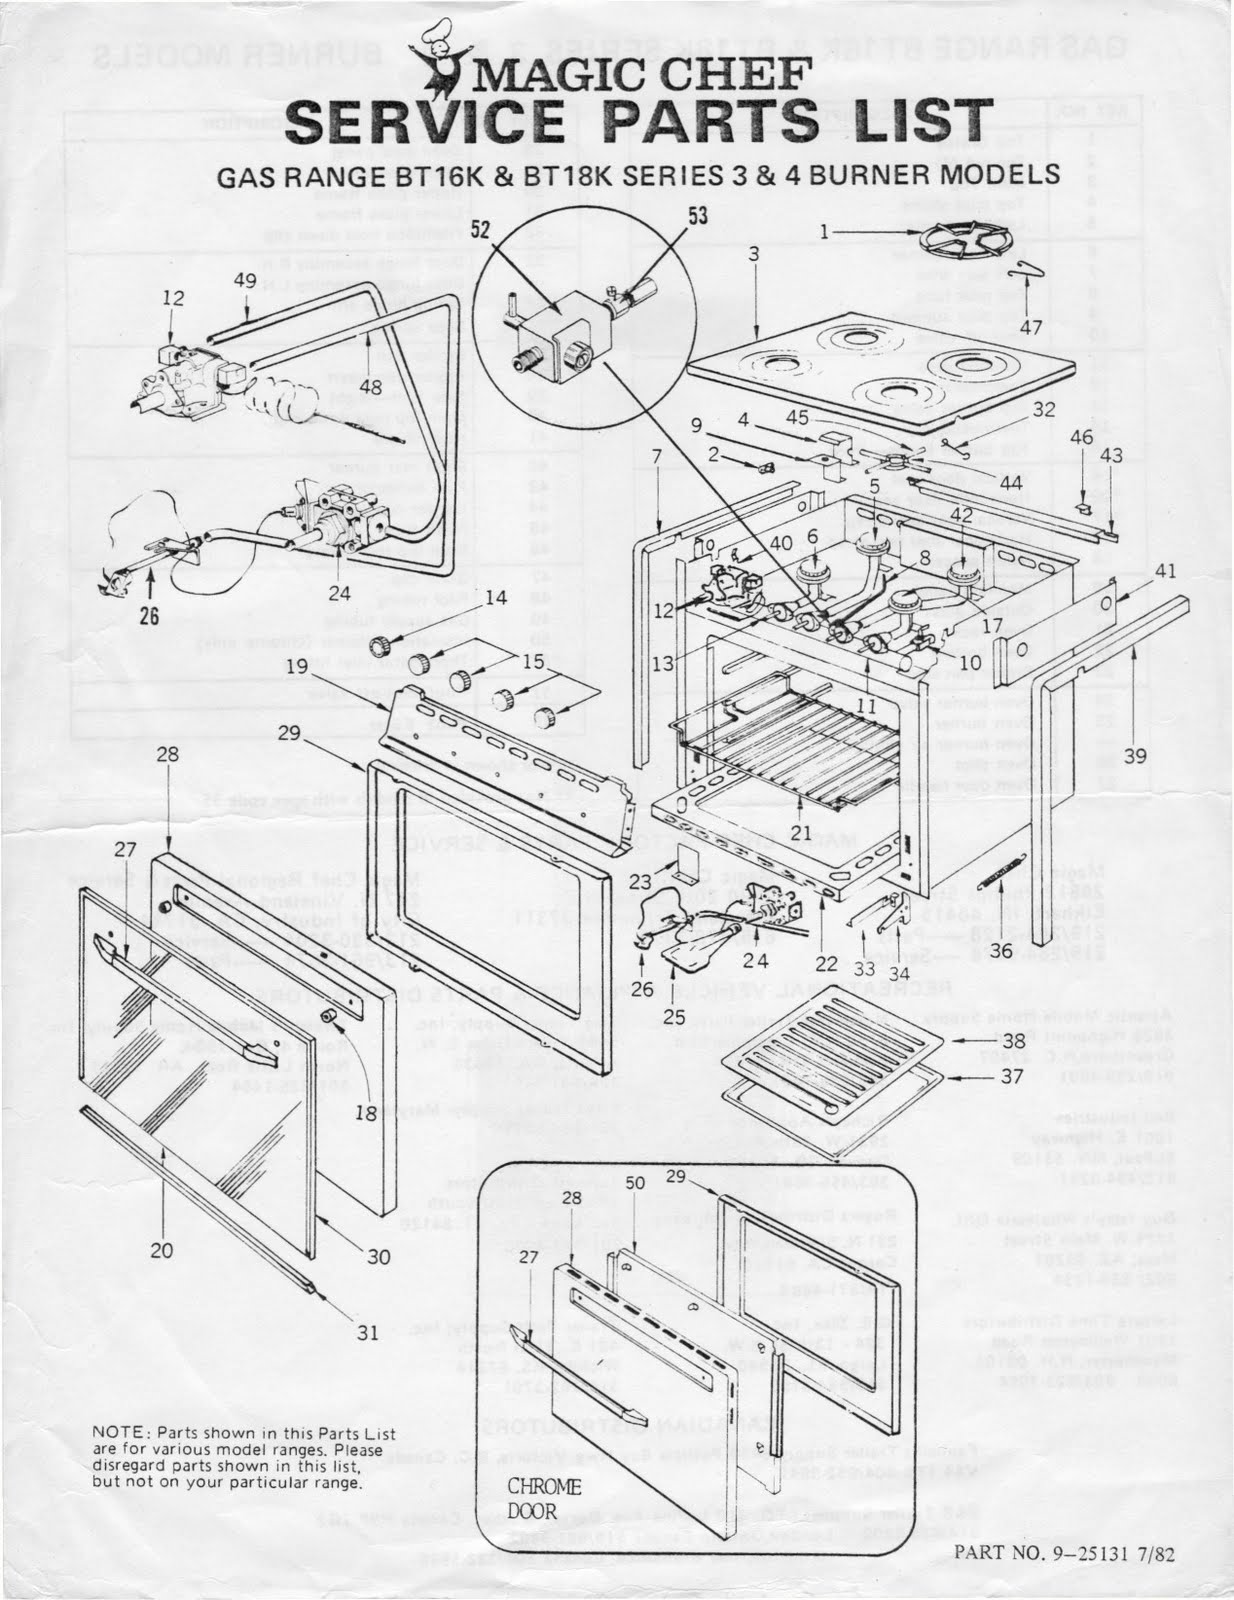 thetford c200 toilet wiring diagram circulatory system heart worksheet rv imageresizertool com